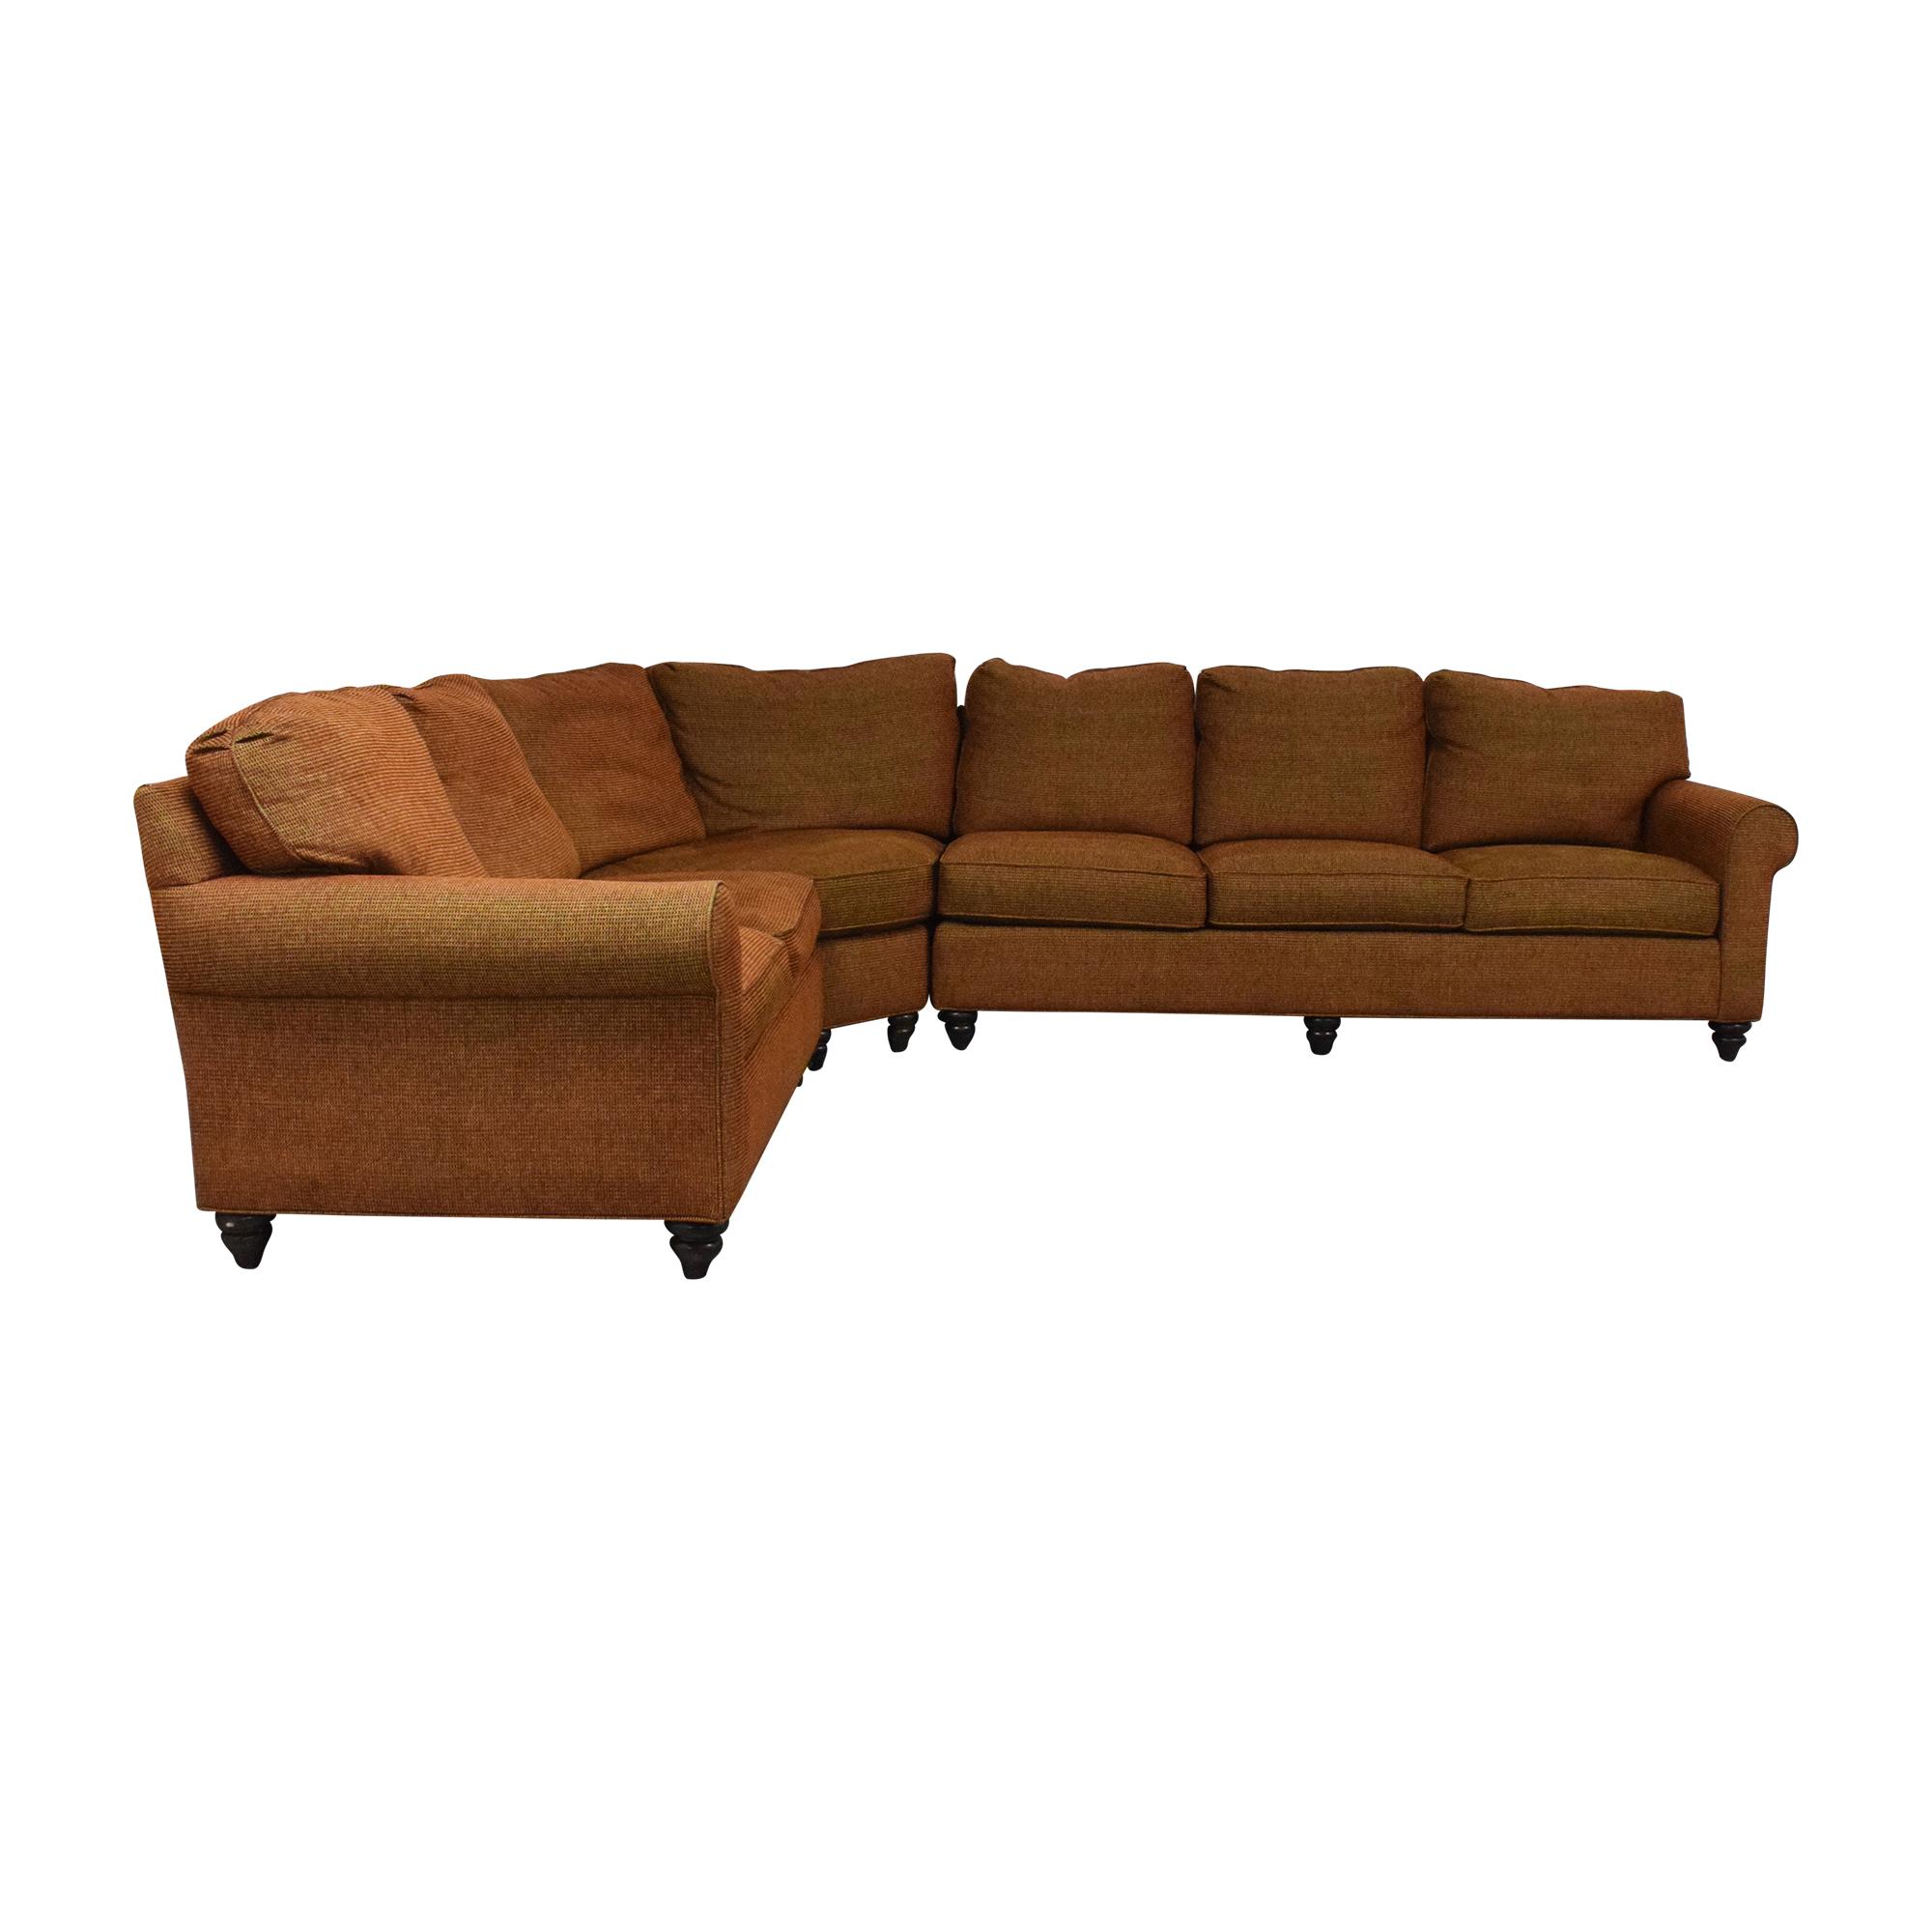 Bassett Furniture Bassett Furniture Corner Sectional Sofa second hand